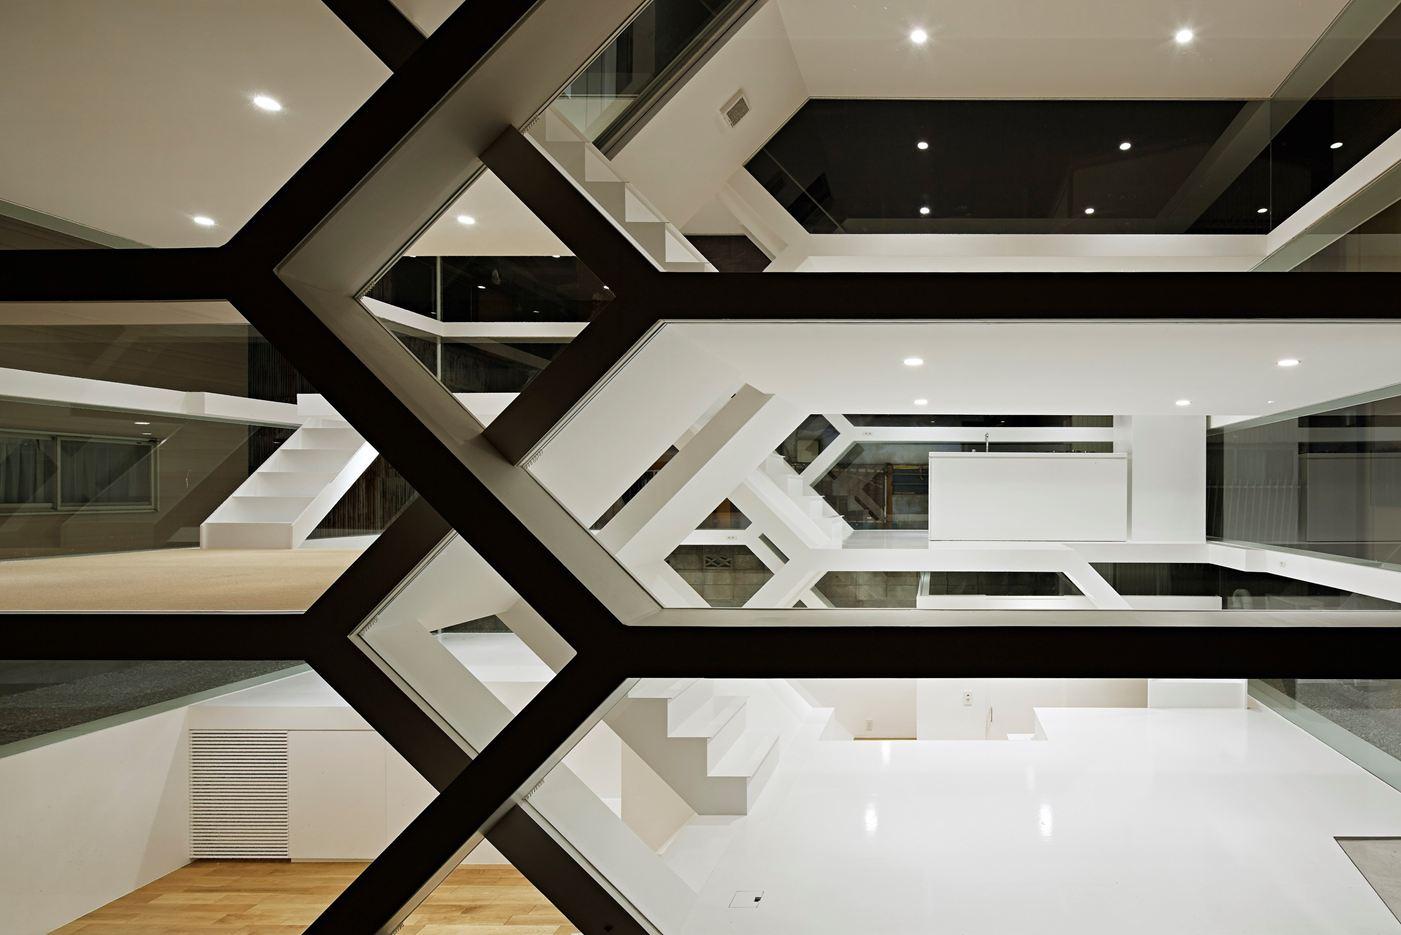 S House in Saitama, Japan by Yuusuke Karasawa Architects